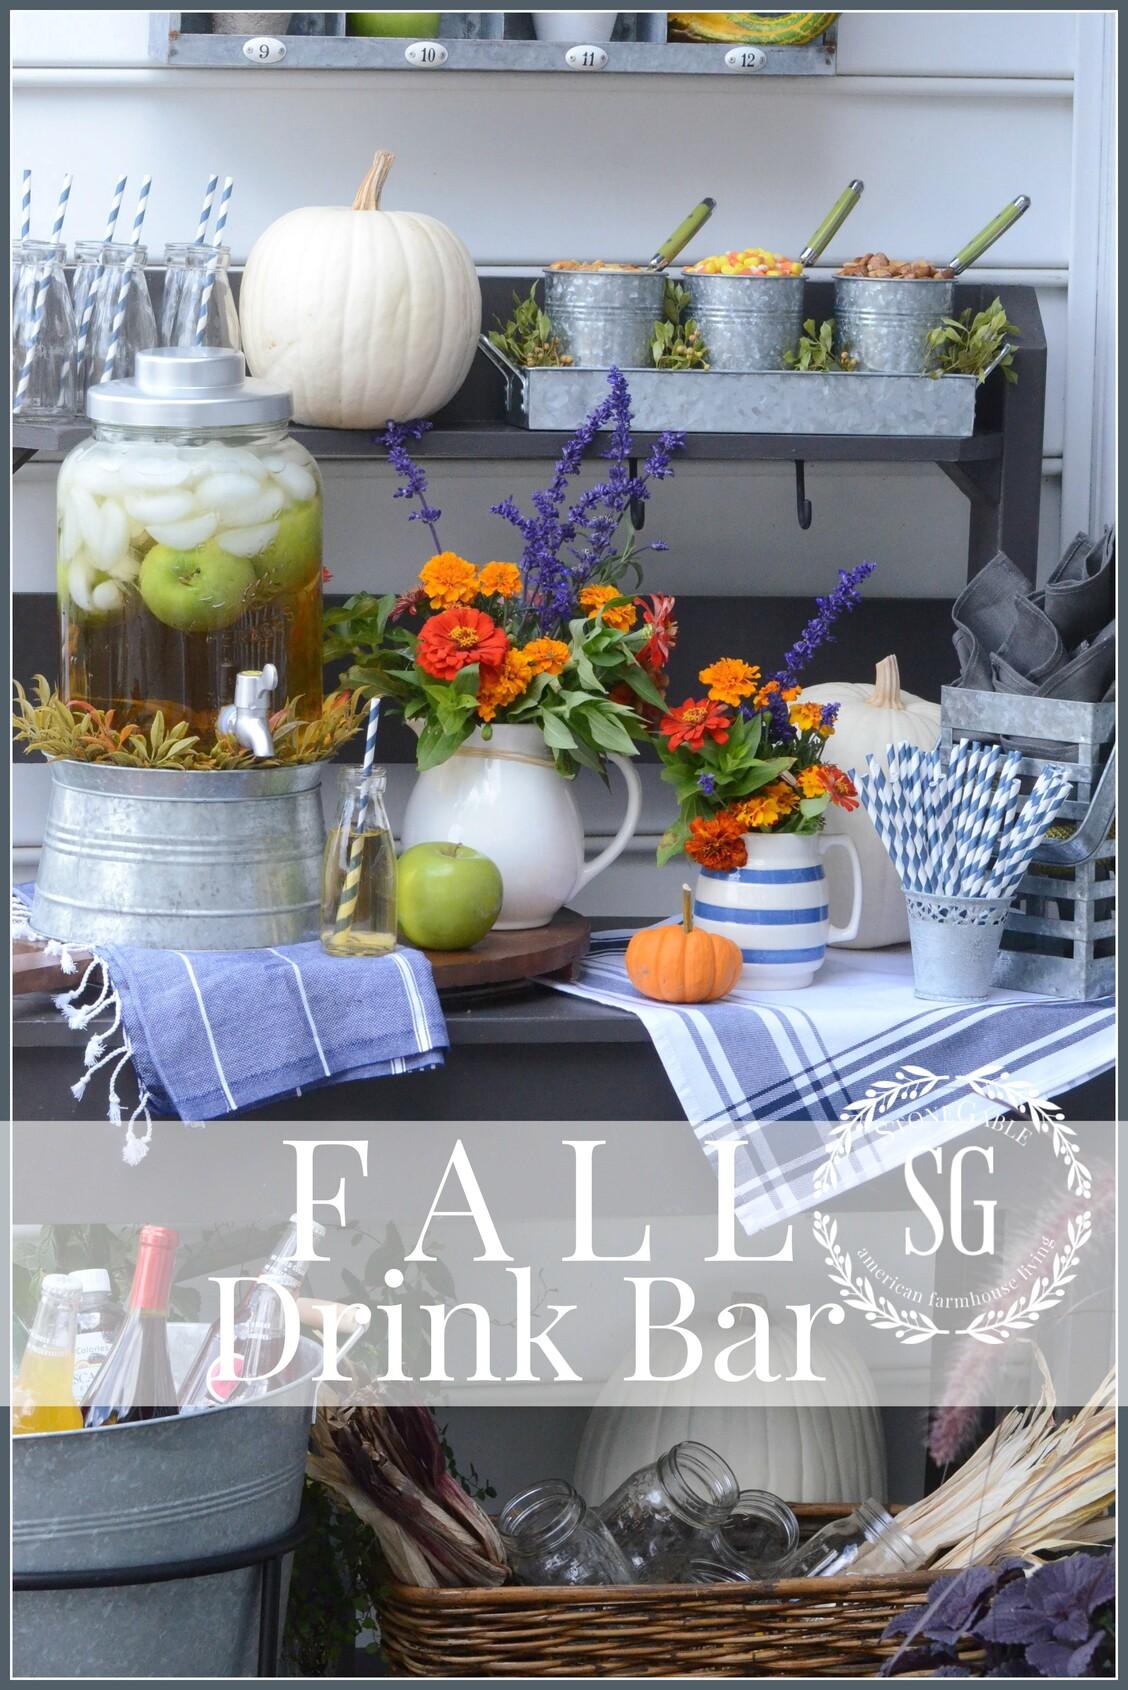 Fall drink bar stonegable for Fun fall drinks